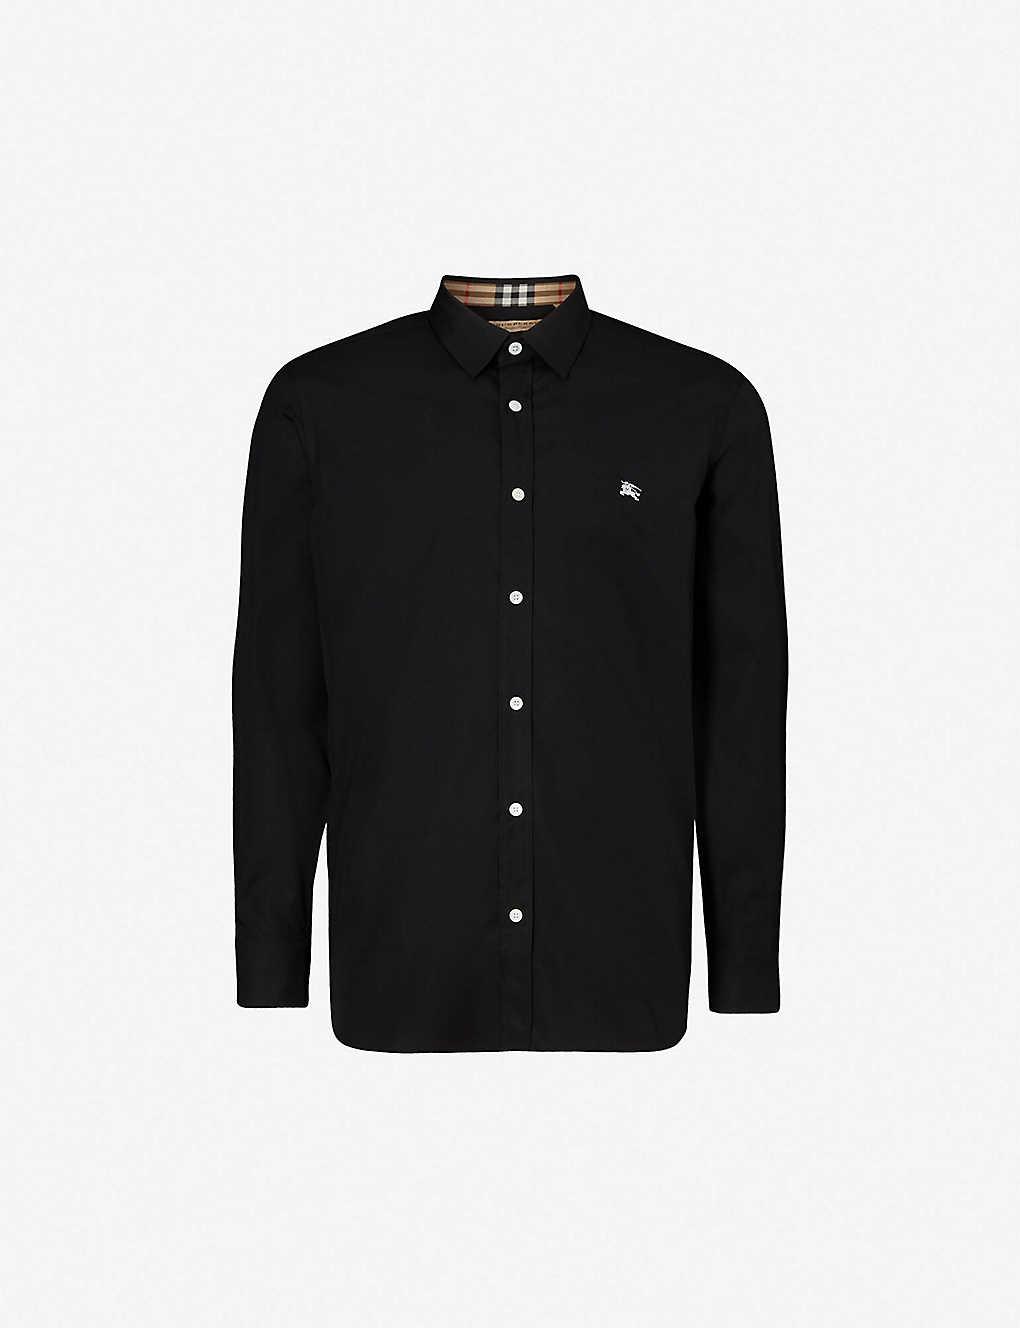 0b49bea4 BURBERRY - Regular-fit stretch-cotton shirt | Selfridges.com